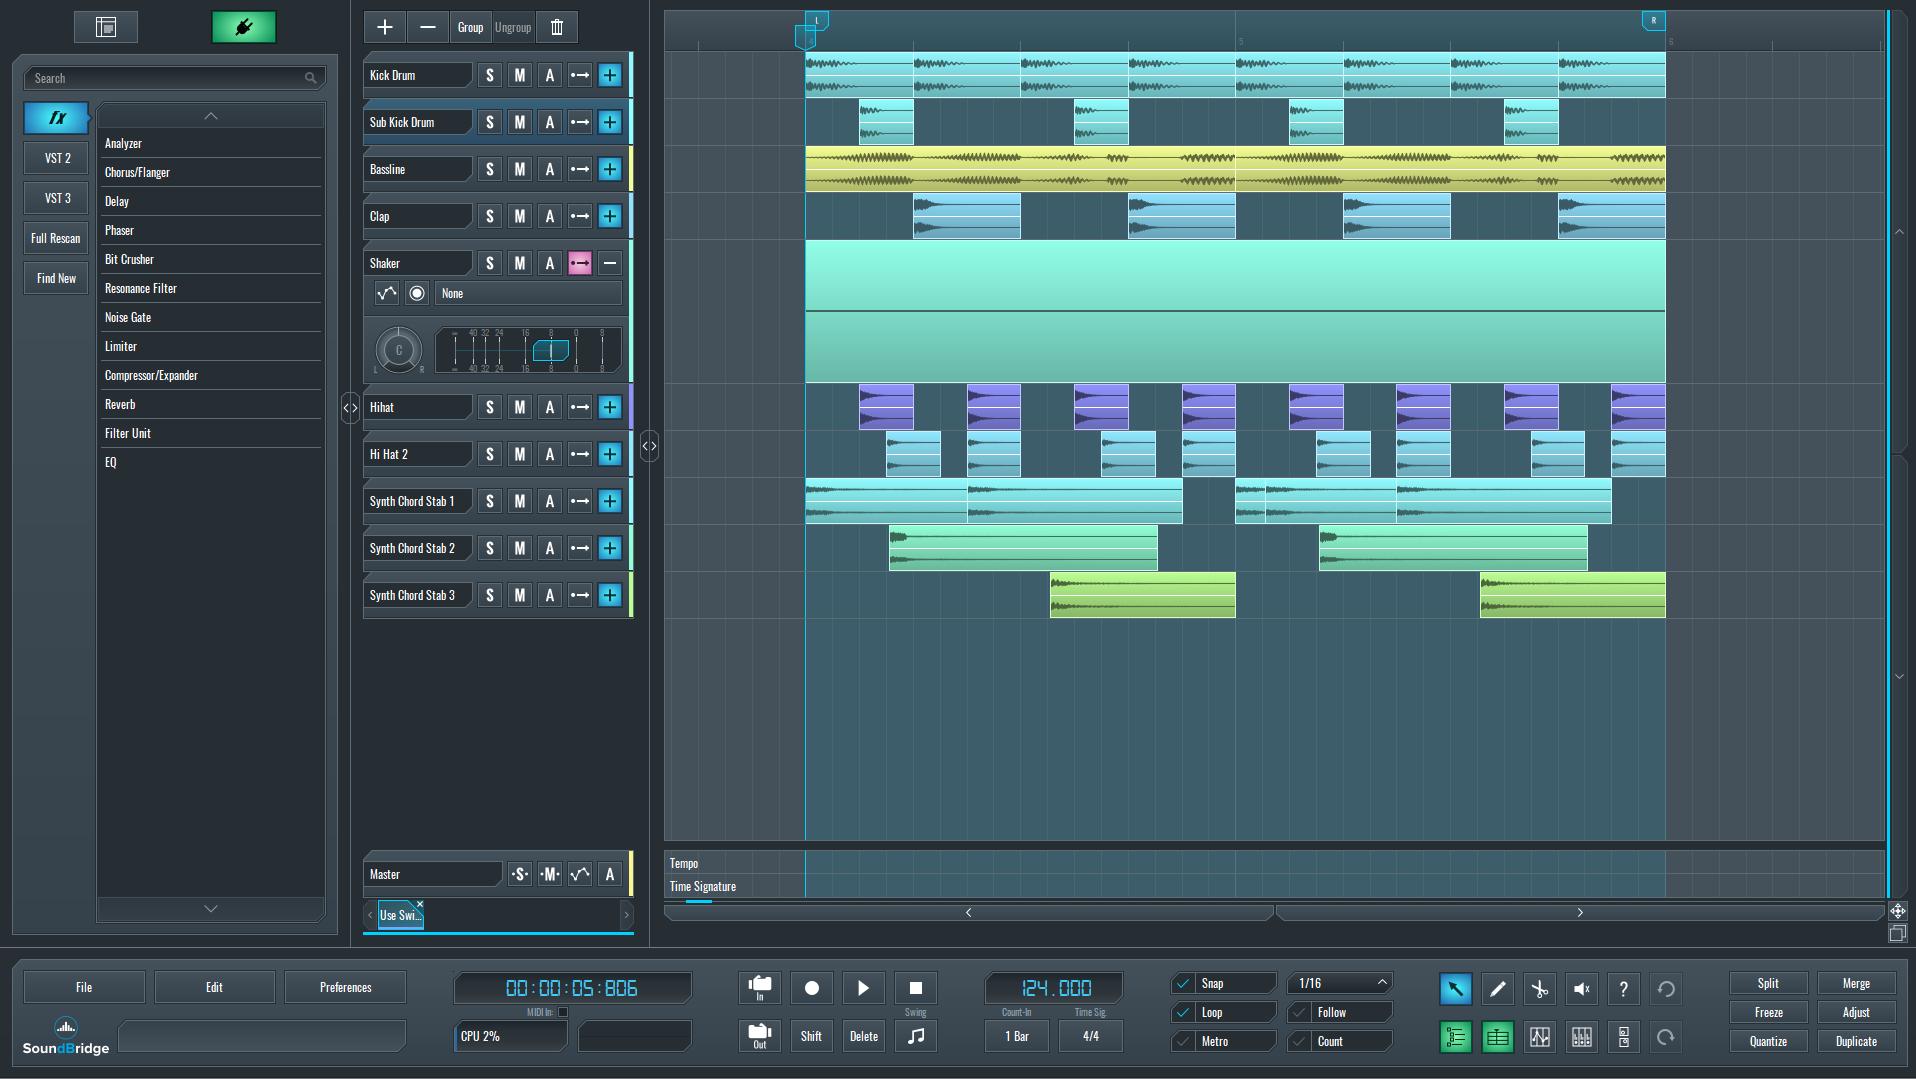 SoundBridge sequence for swing